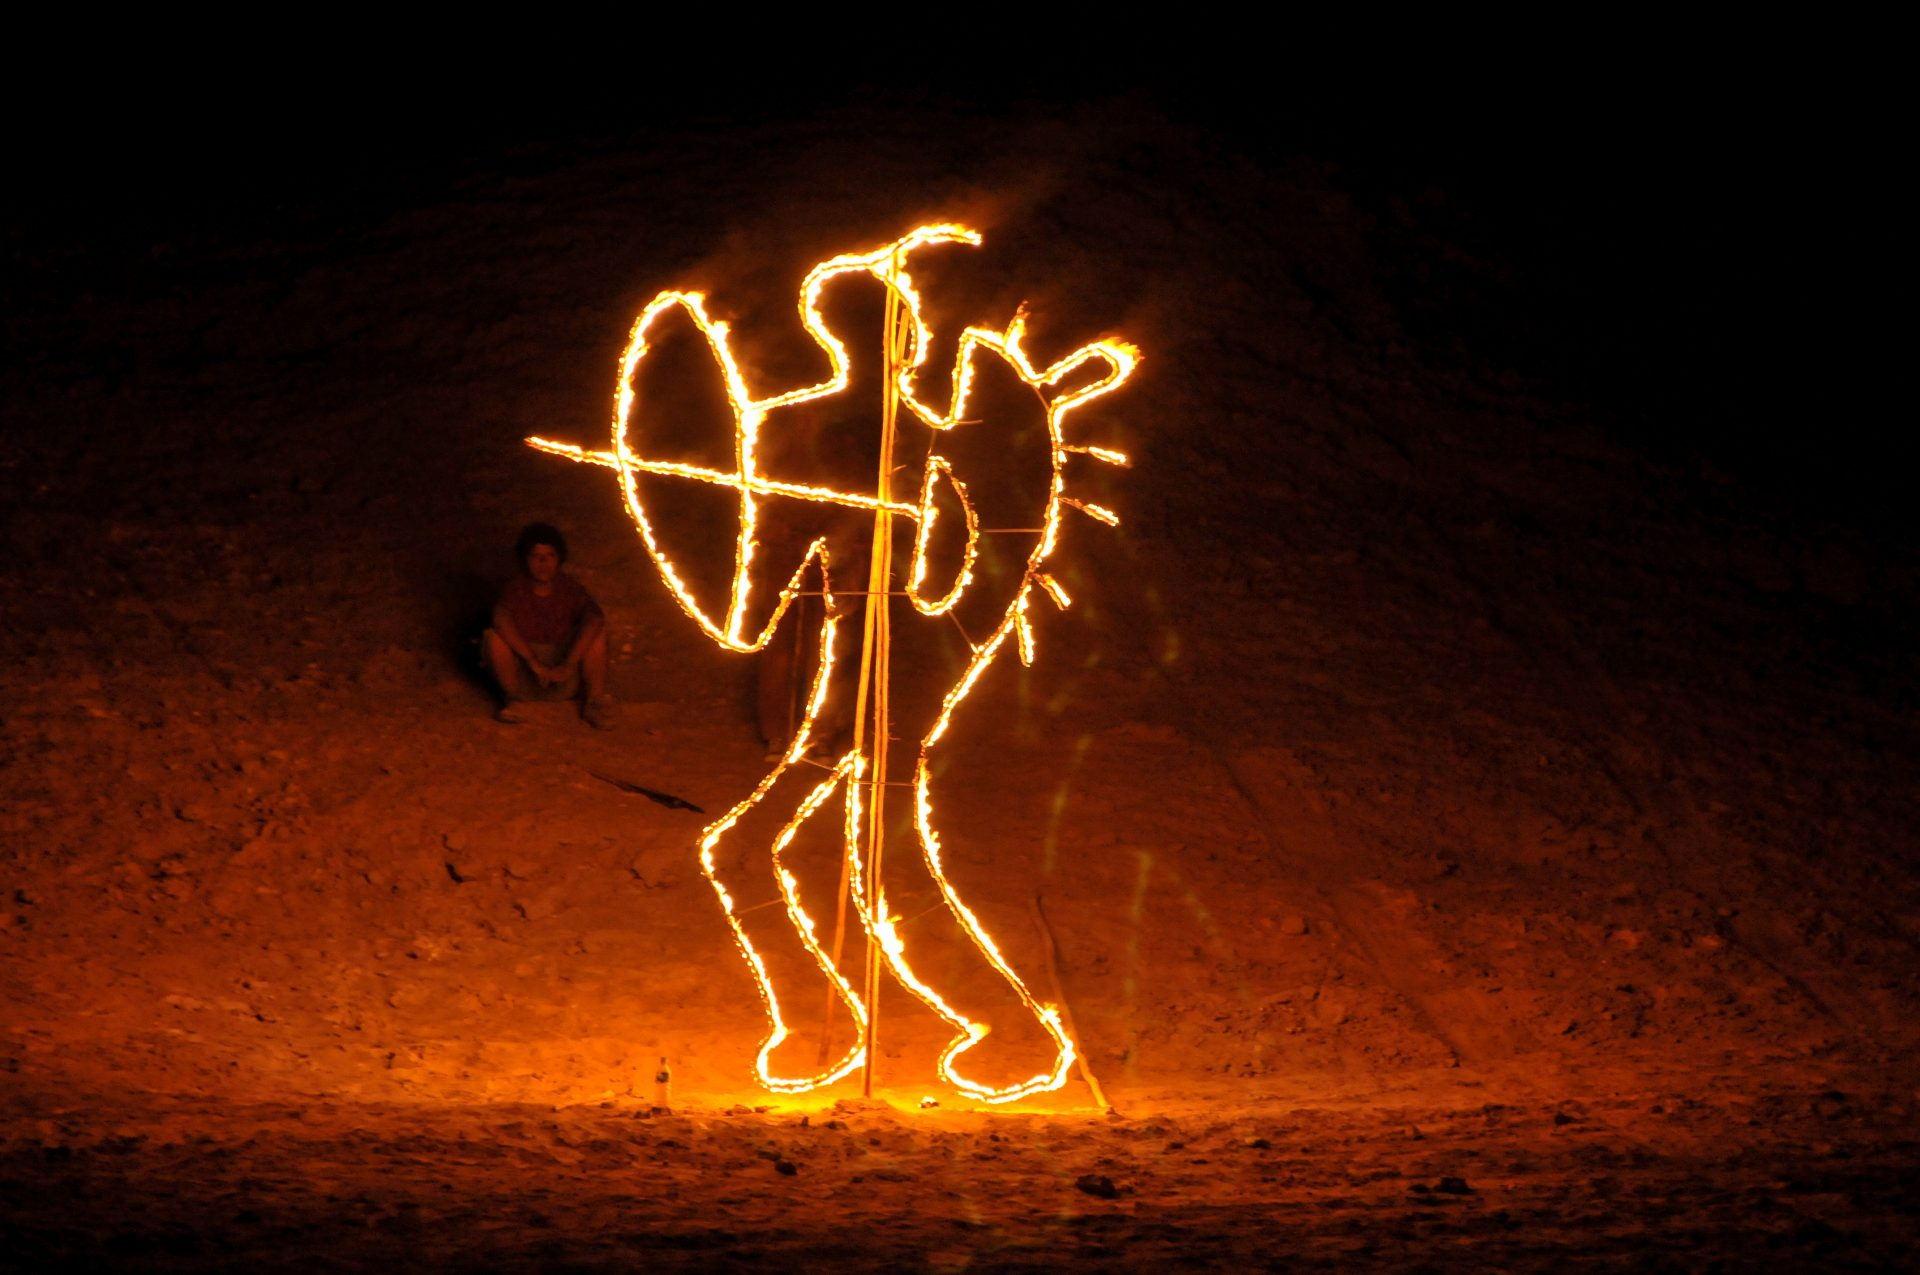 2008_peru_desierto_present3_19_desert_final